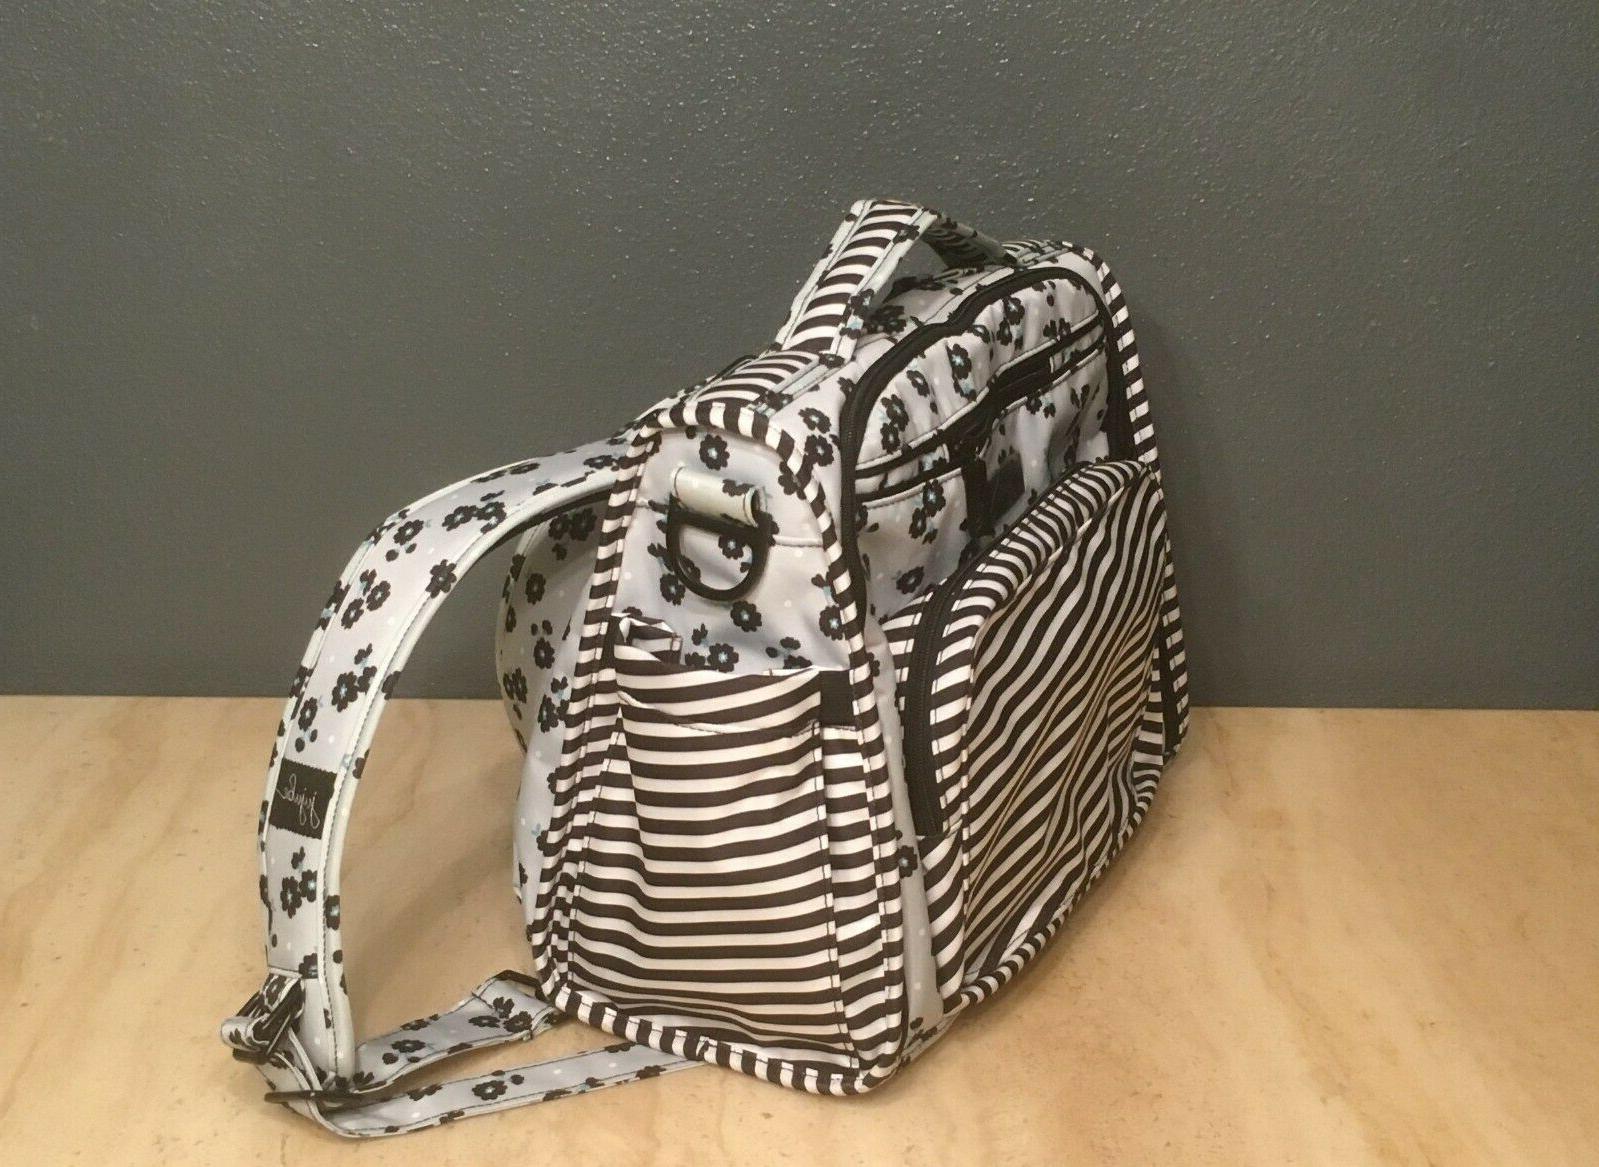 Ju-Ju-Be B.F.F. Diaper Duffle Bag Back